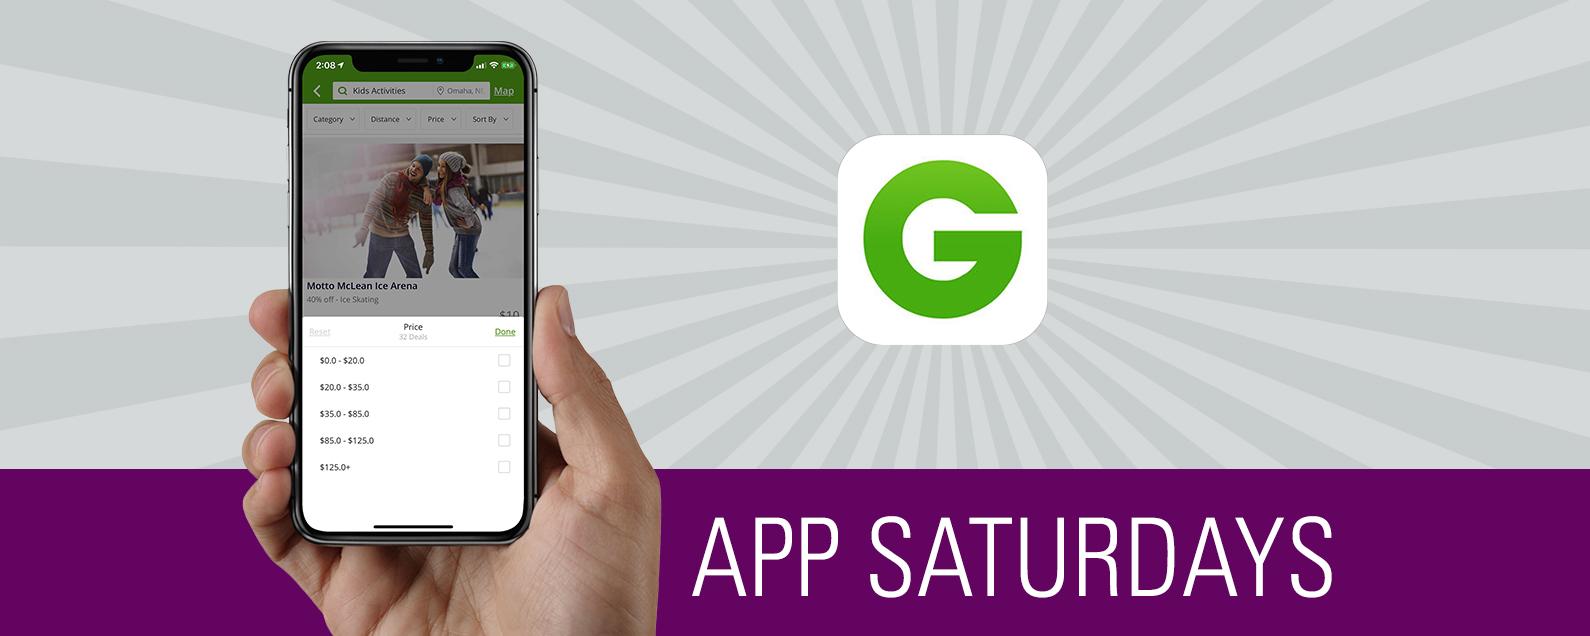 Groupon Mobile App Ipad – Wonderful Image Gallery